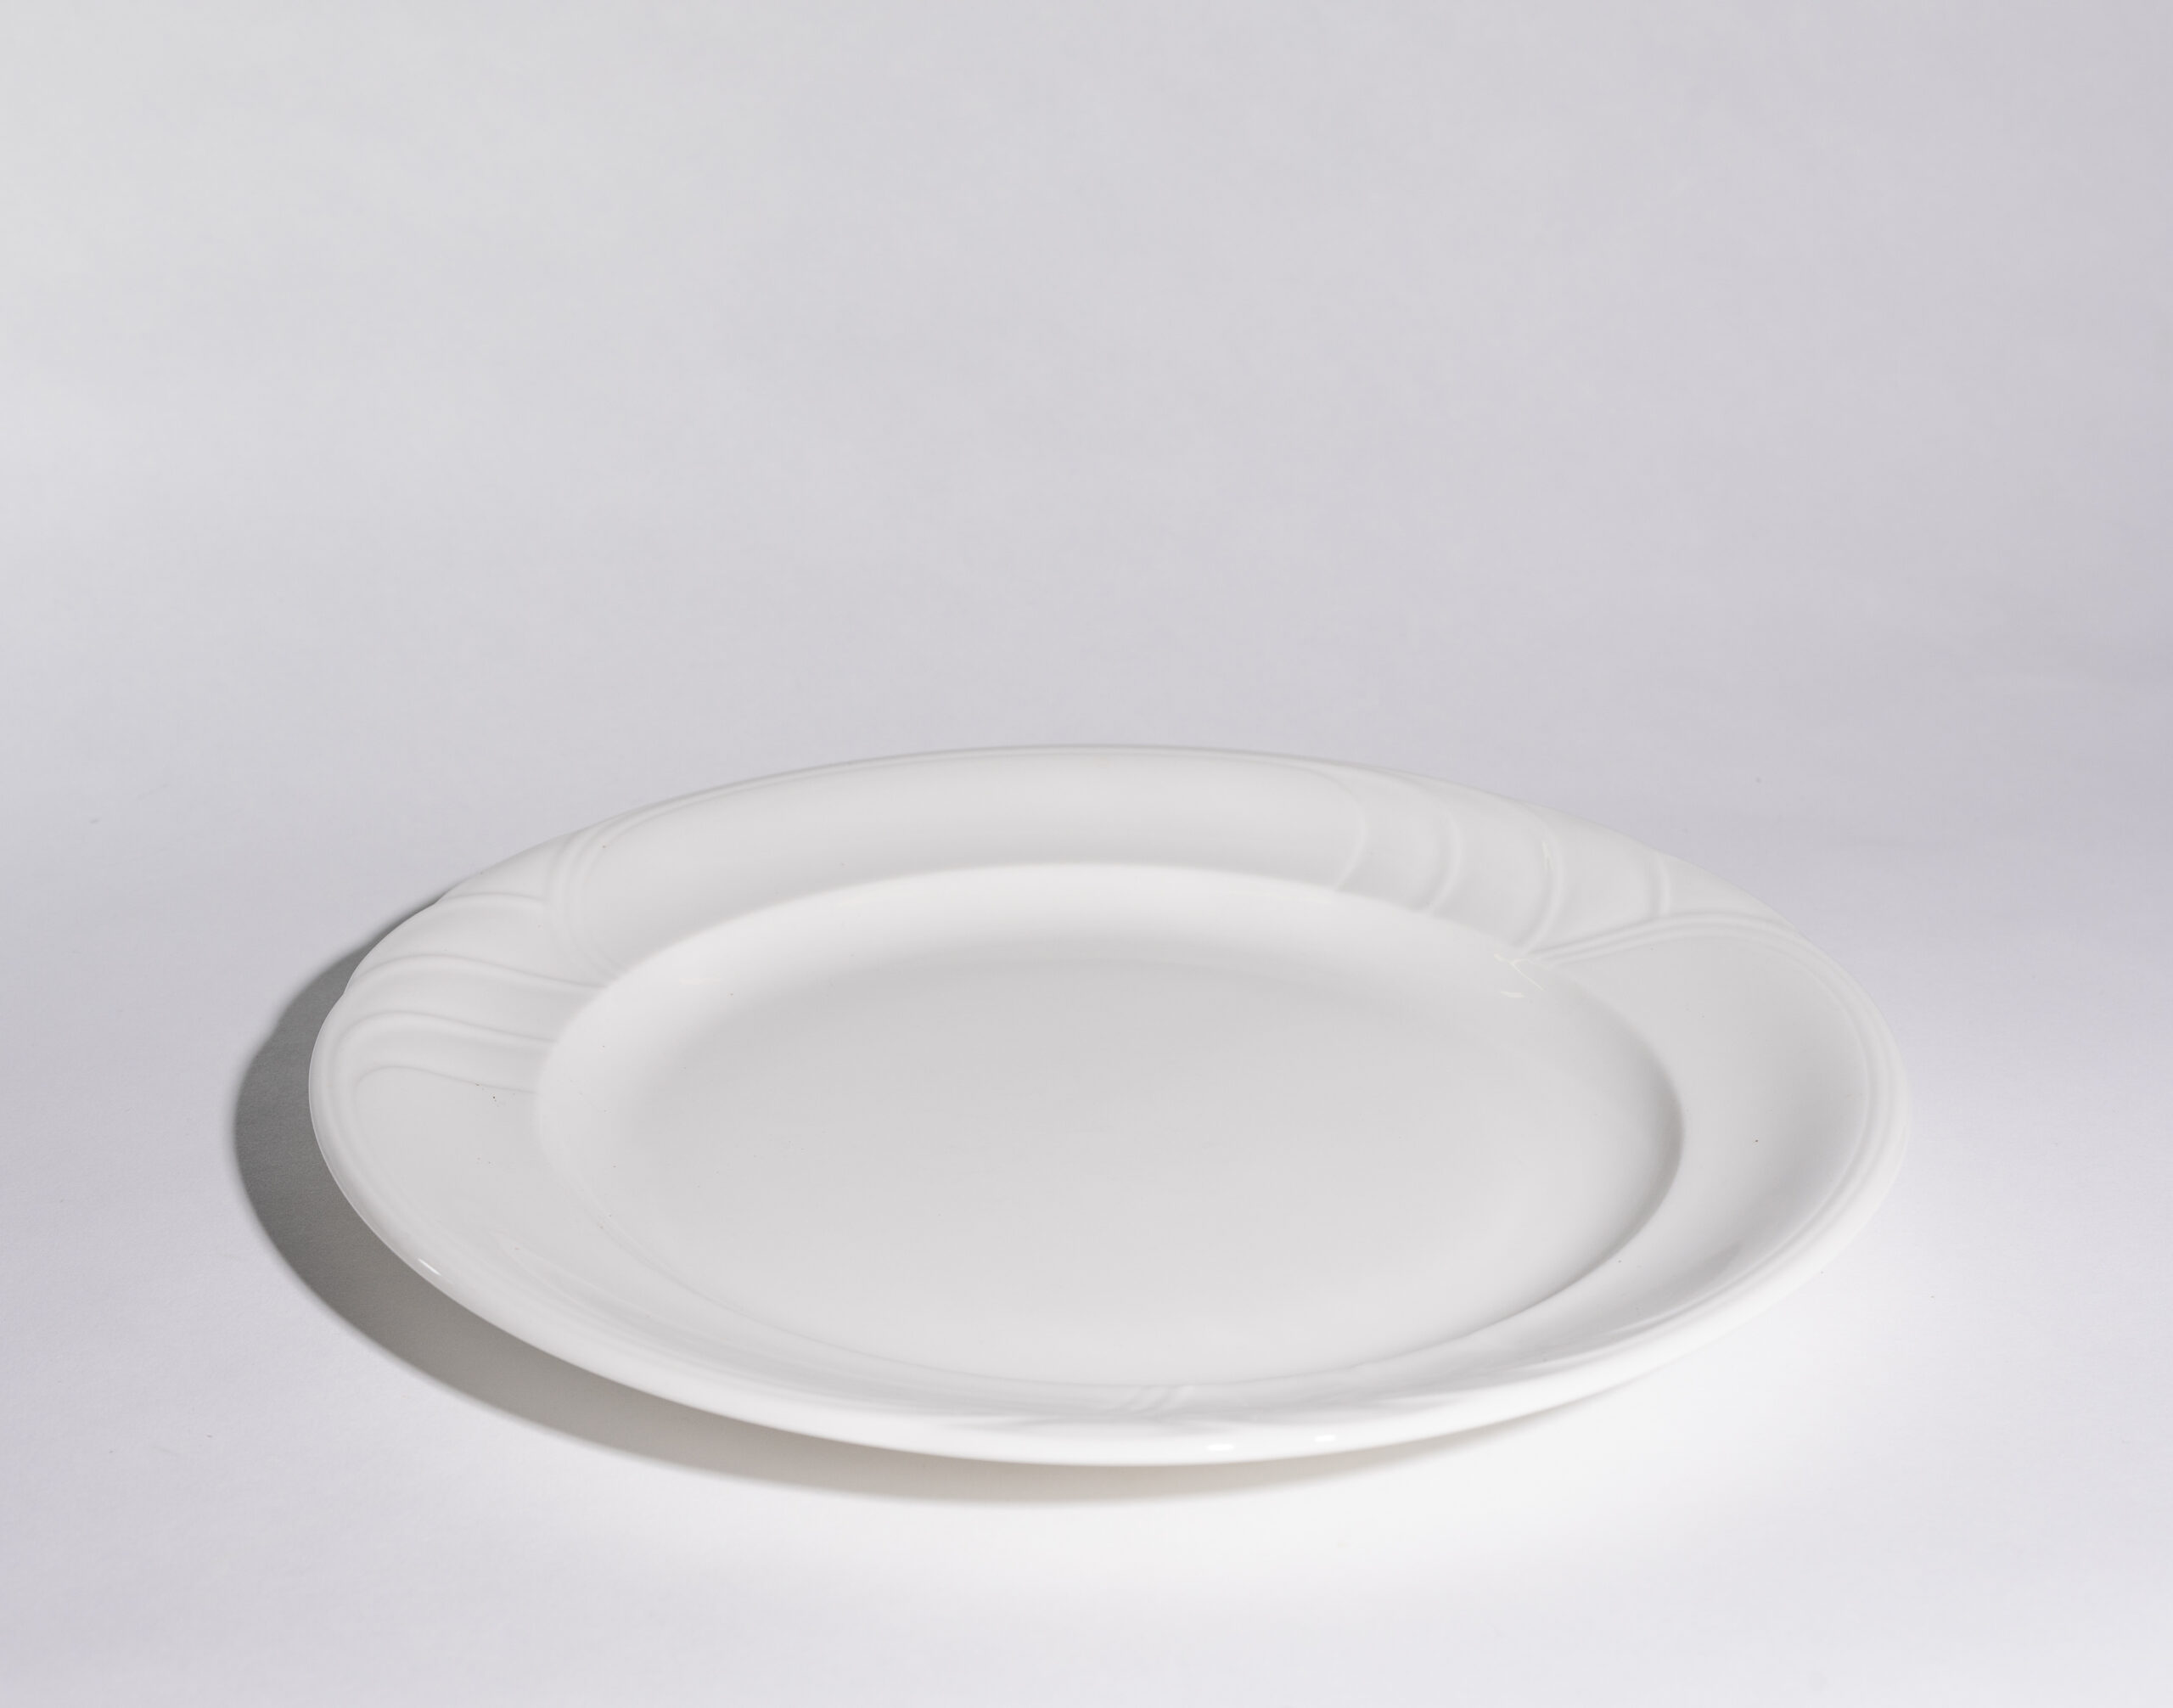 Dinner plates (12'')